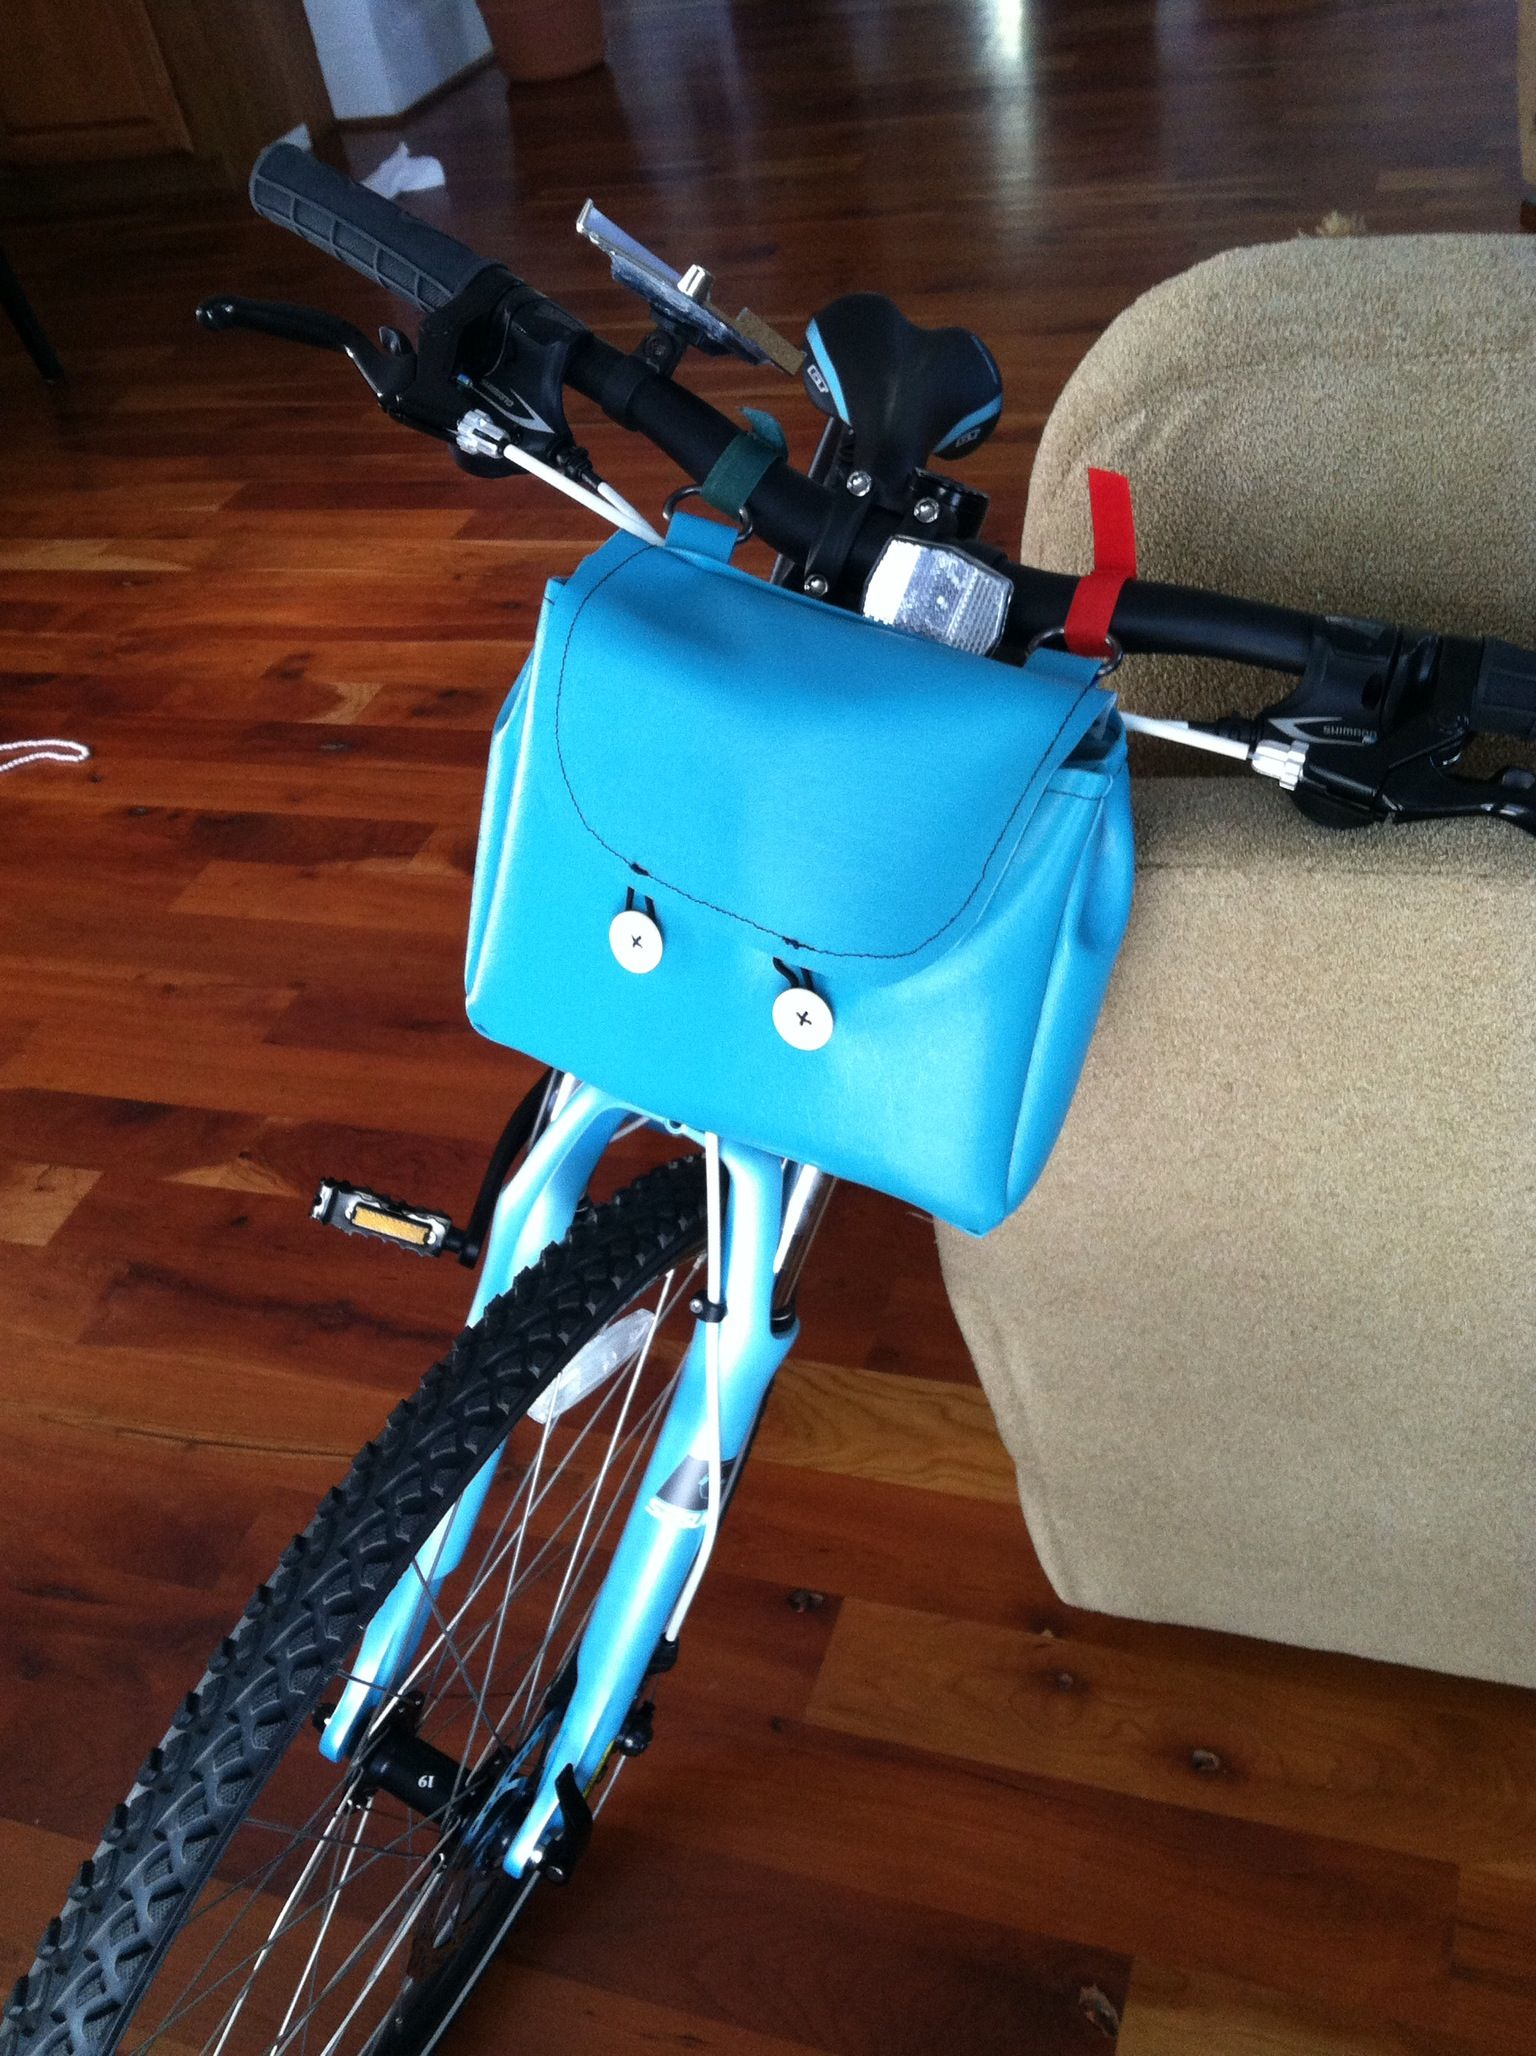 Made My Own Diy Handlebar Bag Bike Bag Now I Can Pack My Mini First Aid Kit And Snacks 3 Total 1 4 Yard Viny Bike Bag Handlebar Bag Mini First Aid Kit